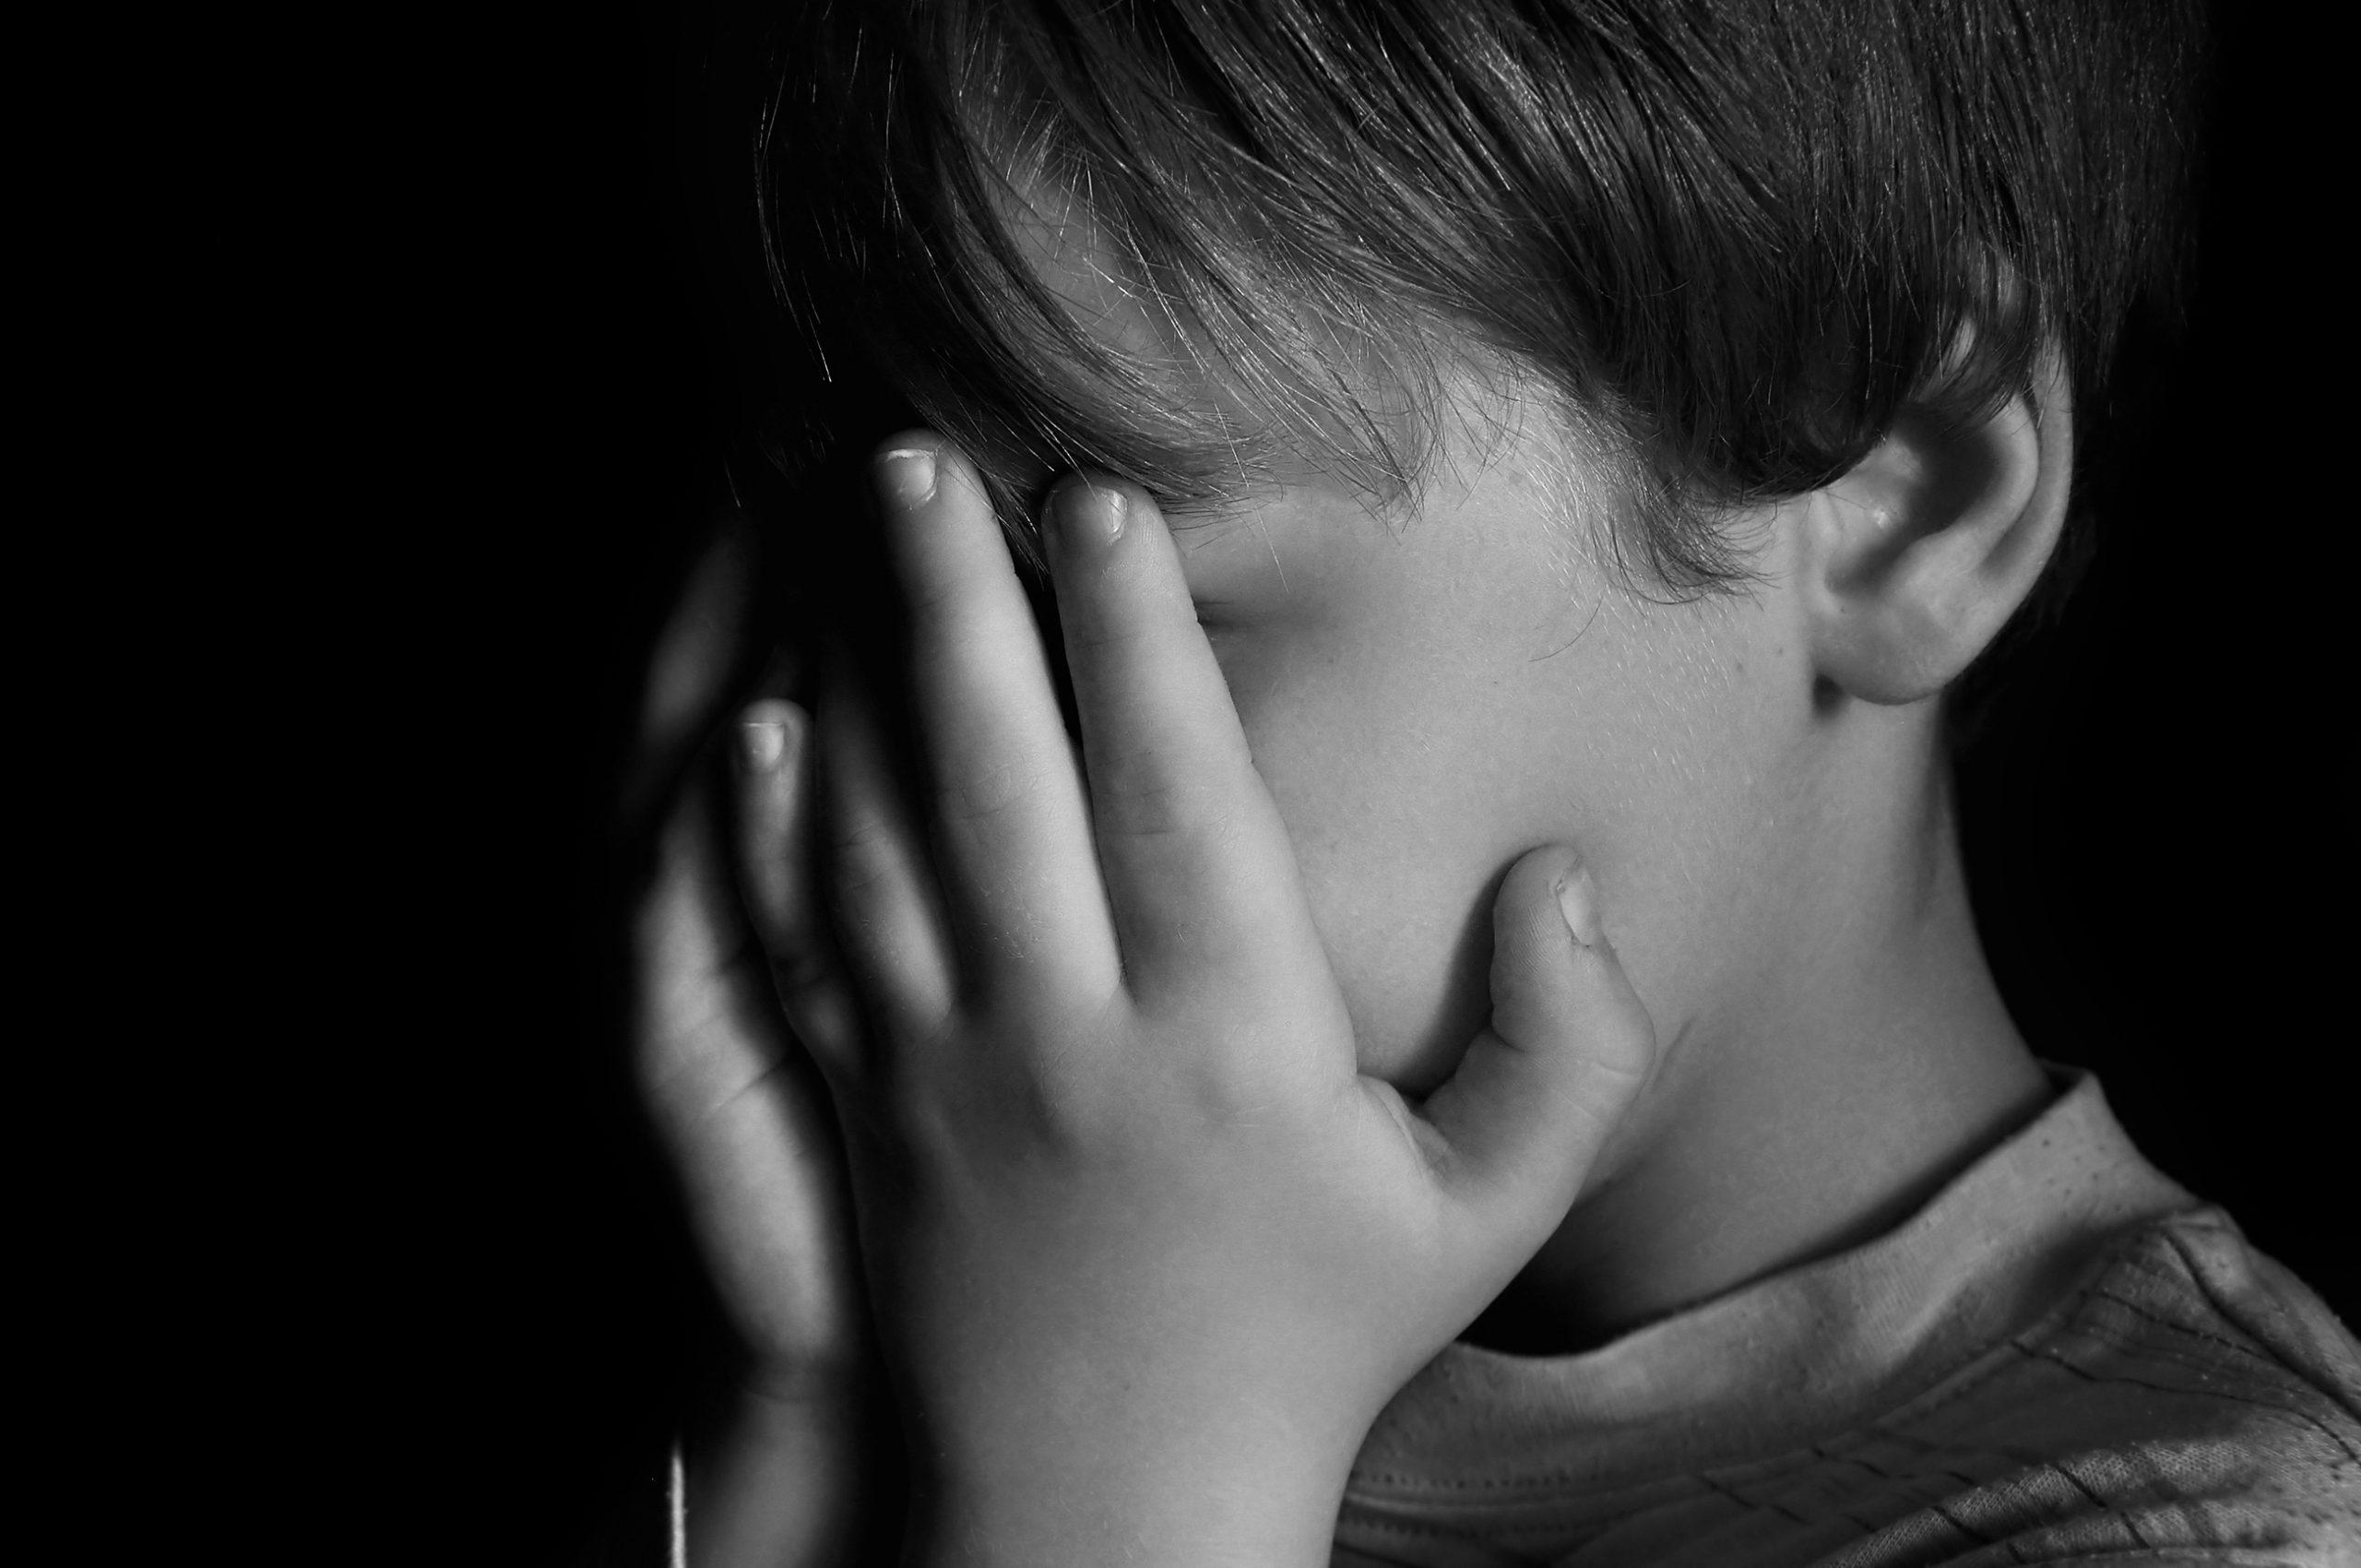 child abuse crying